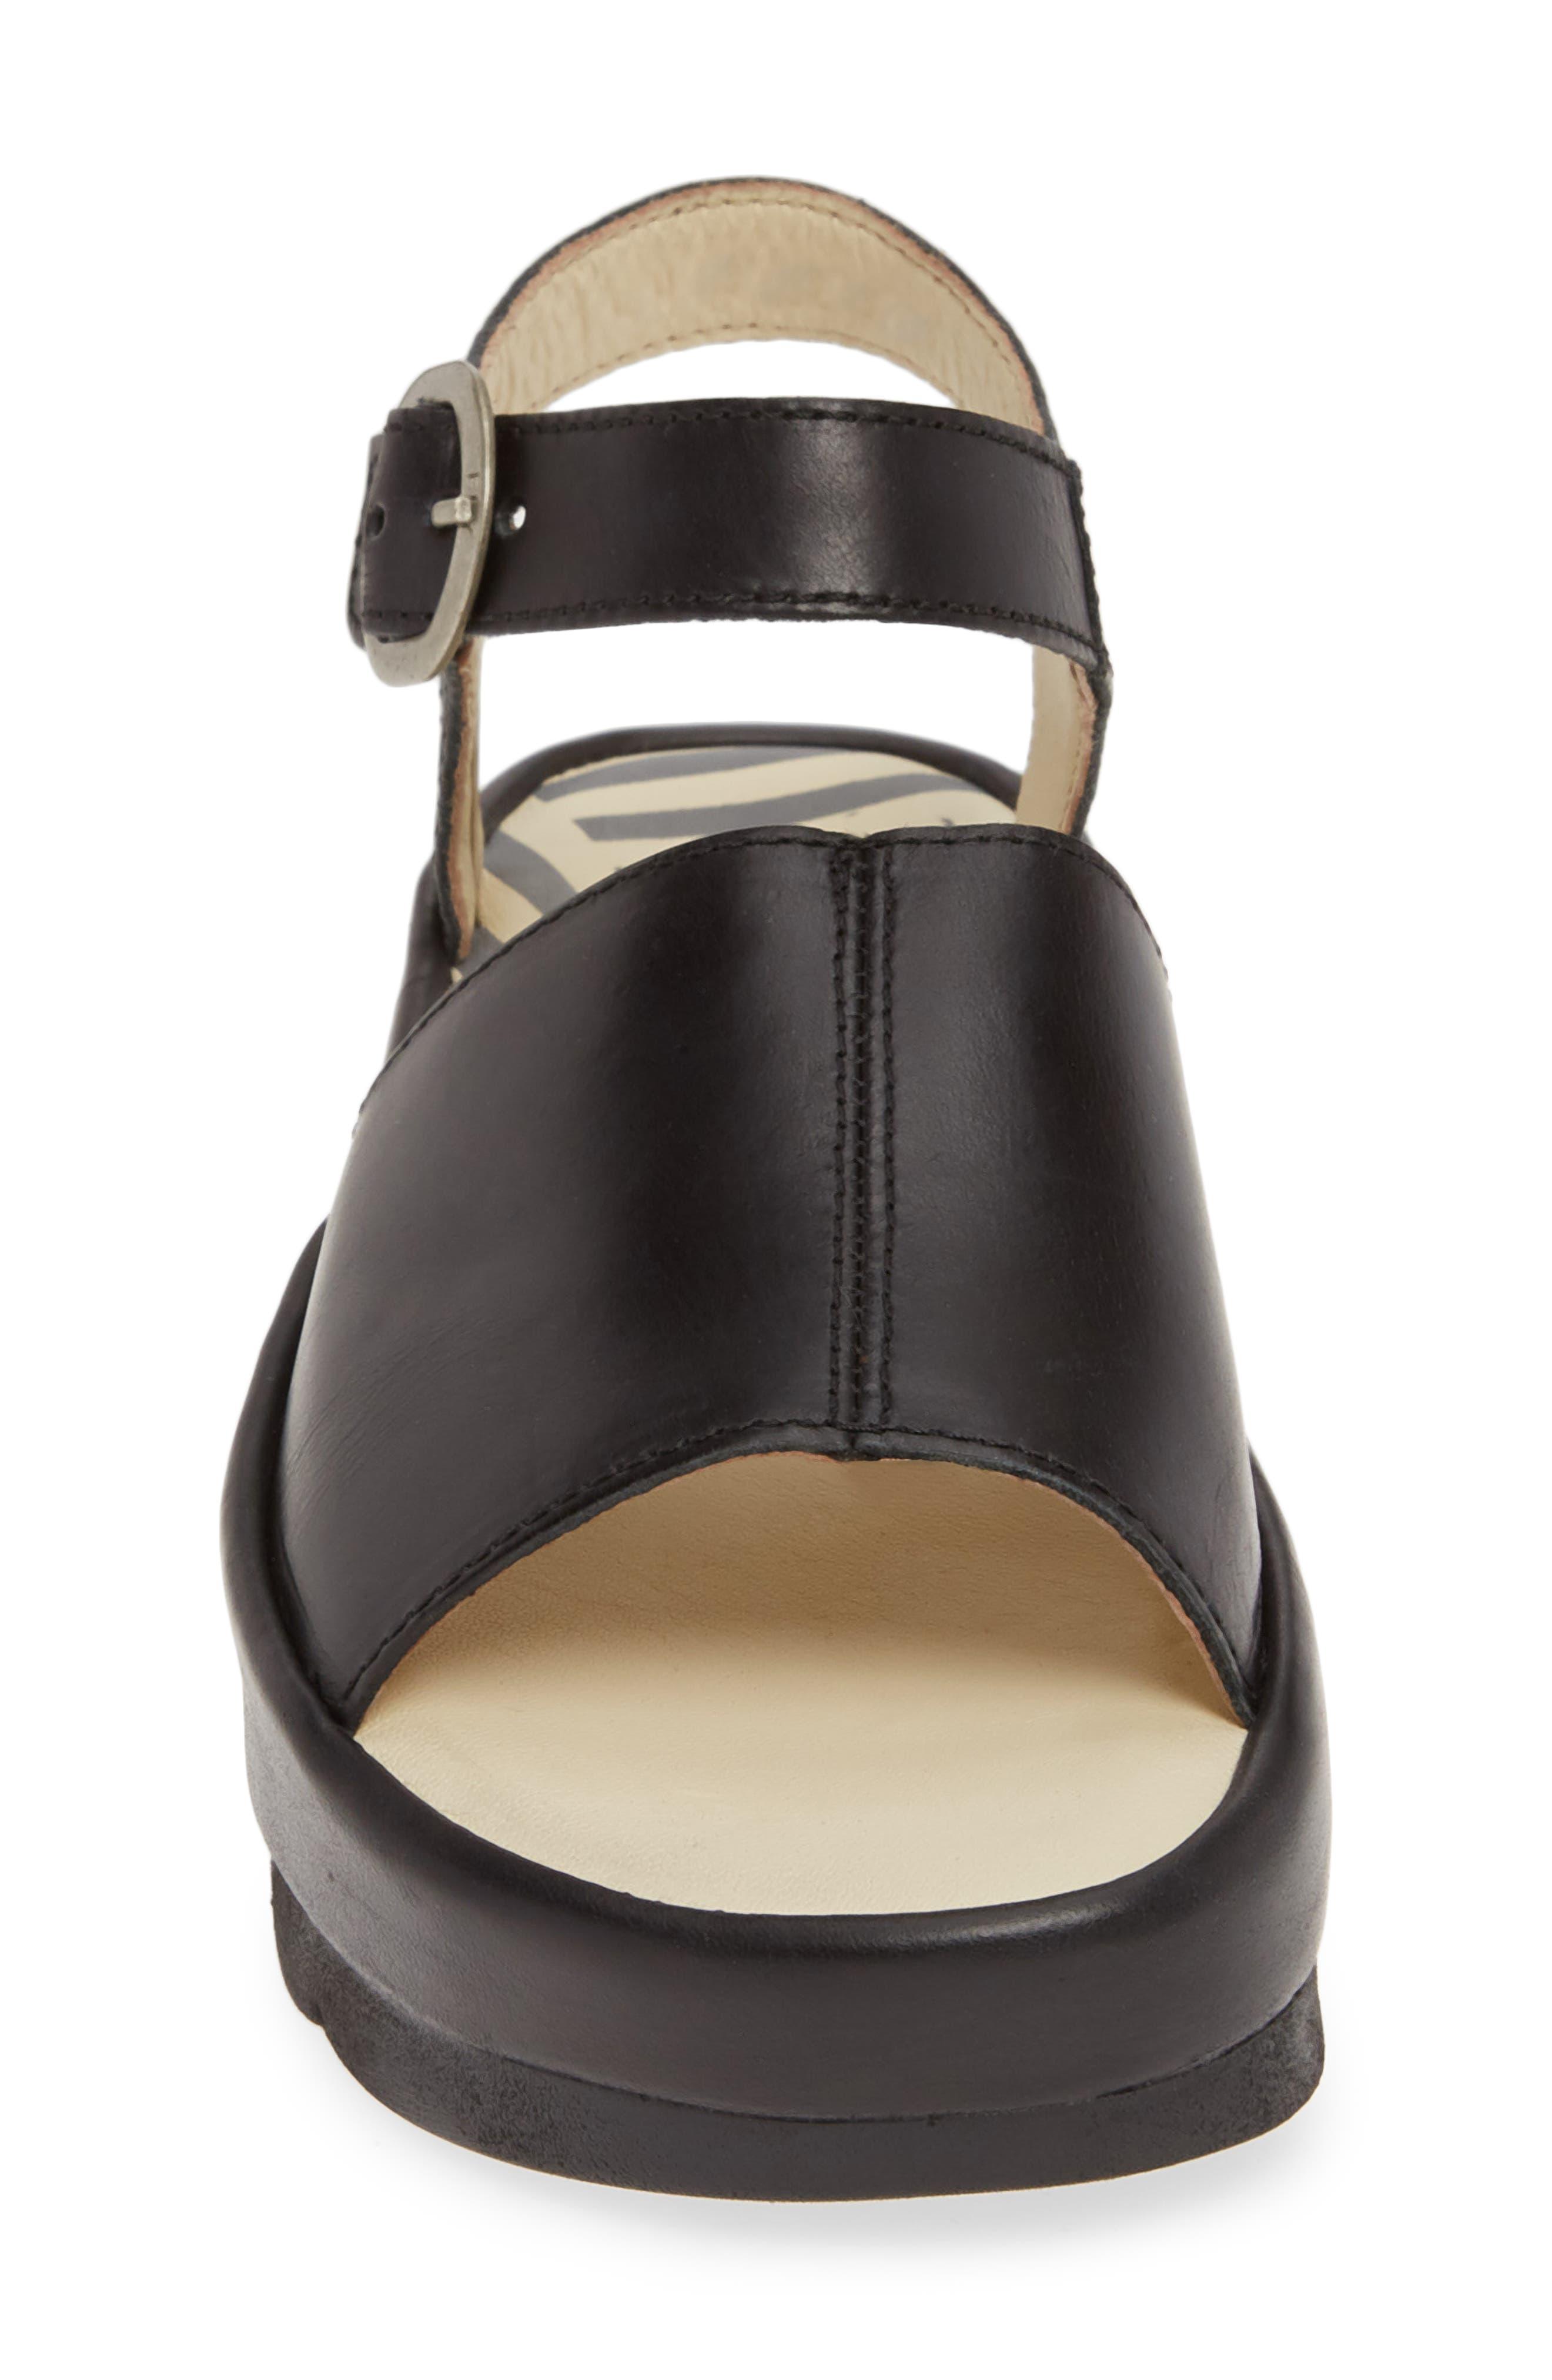 FLY LONDON, Bano Platform Sandal, Alternate thumbnail 4, color, BLACK LEATHER